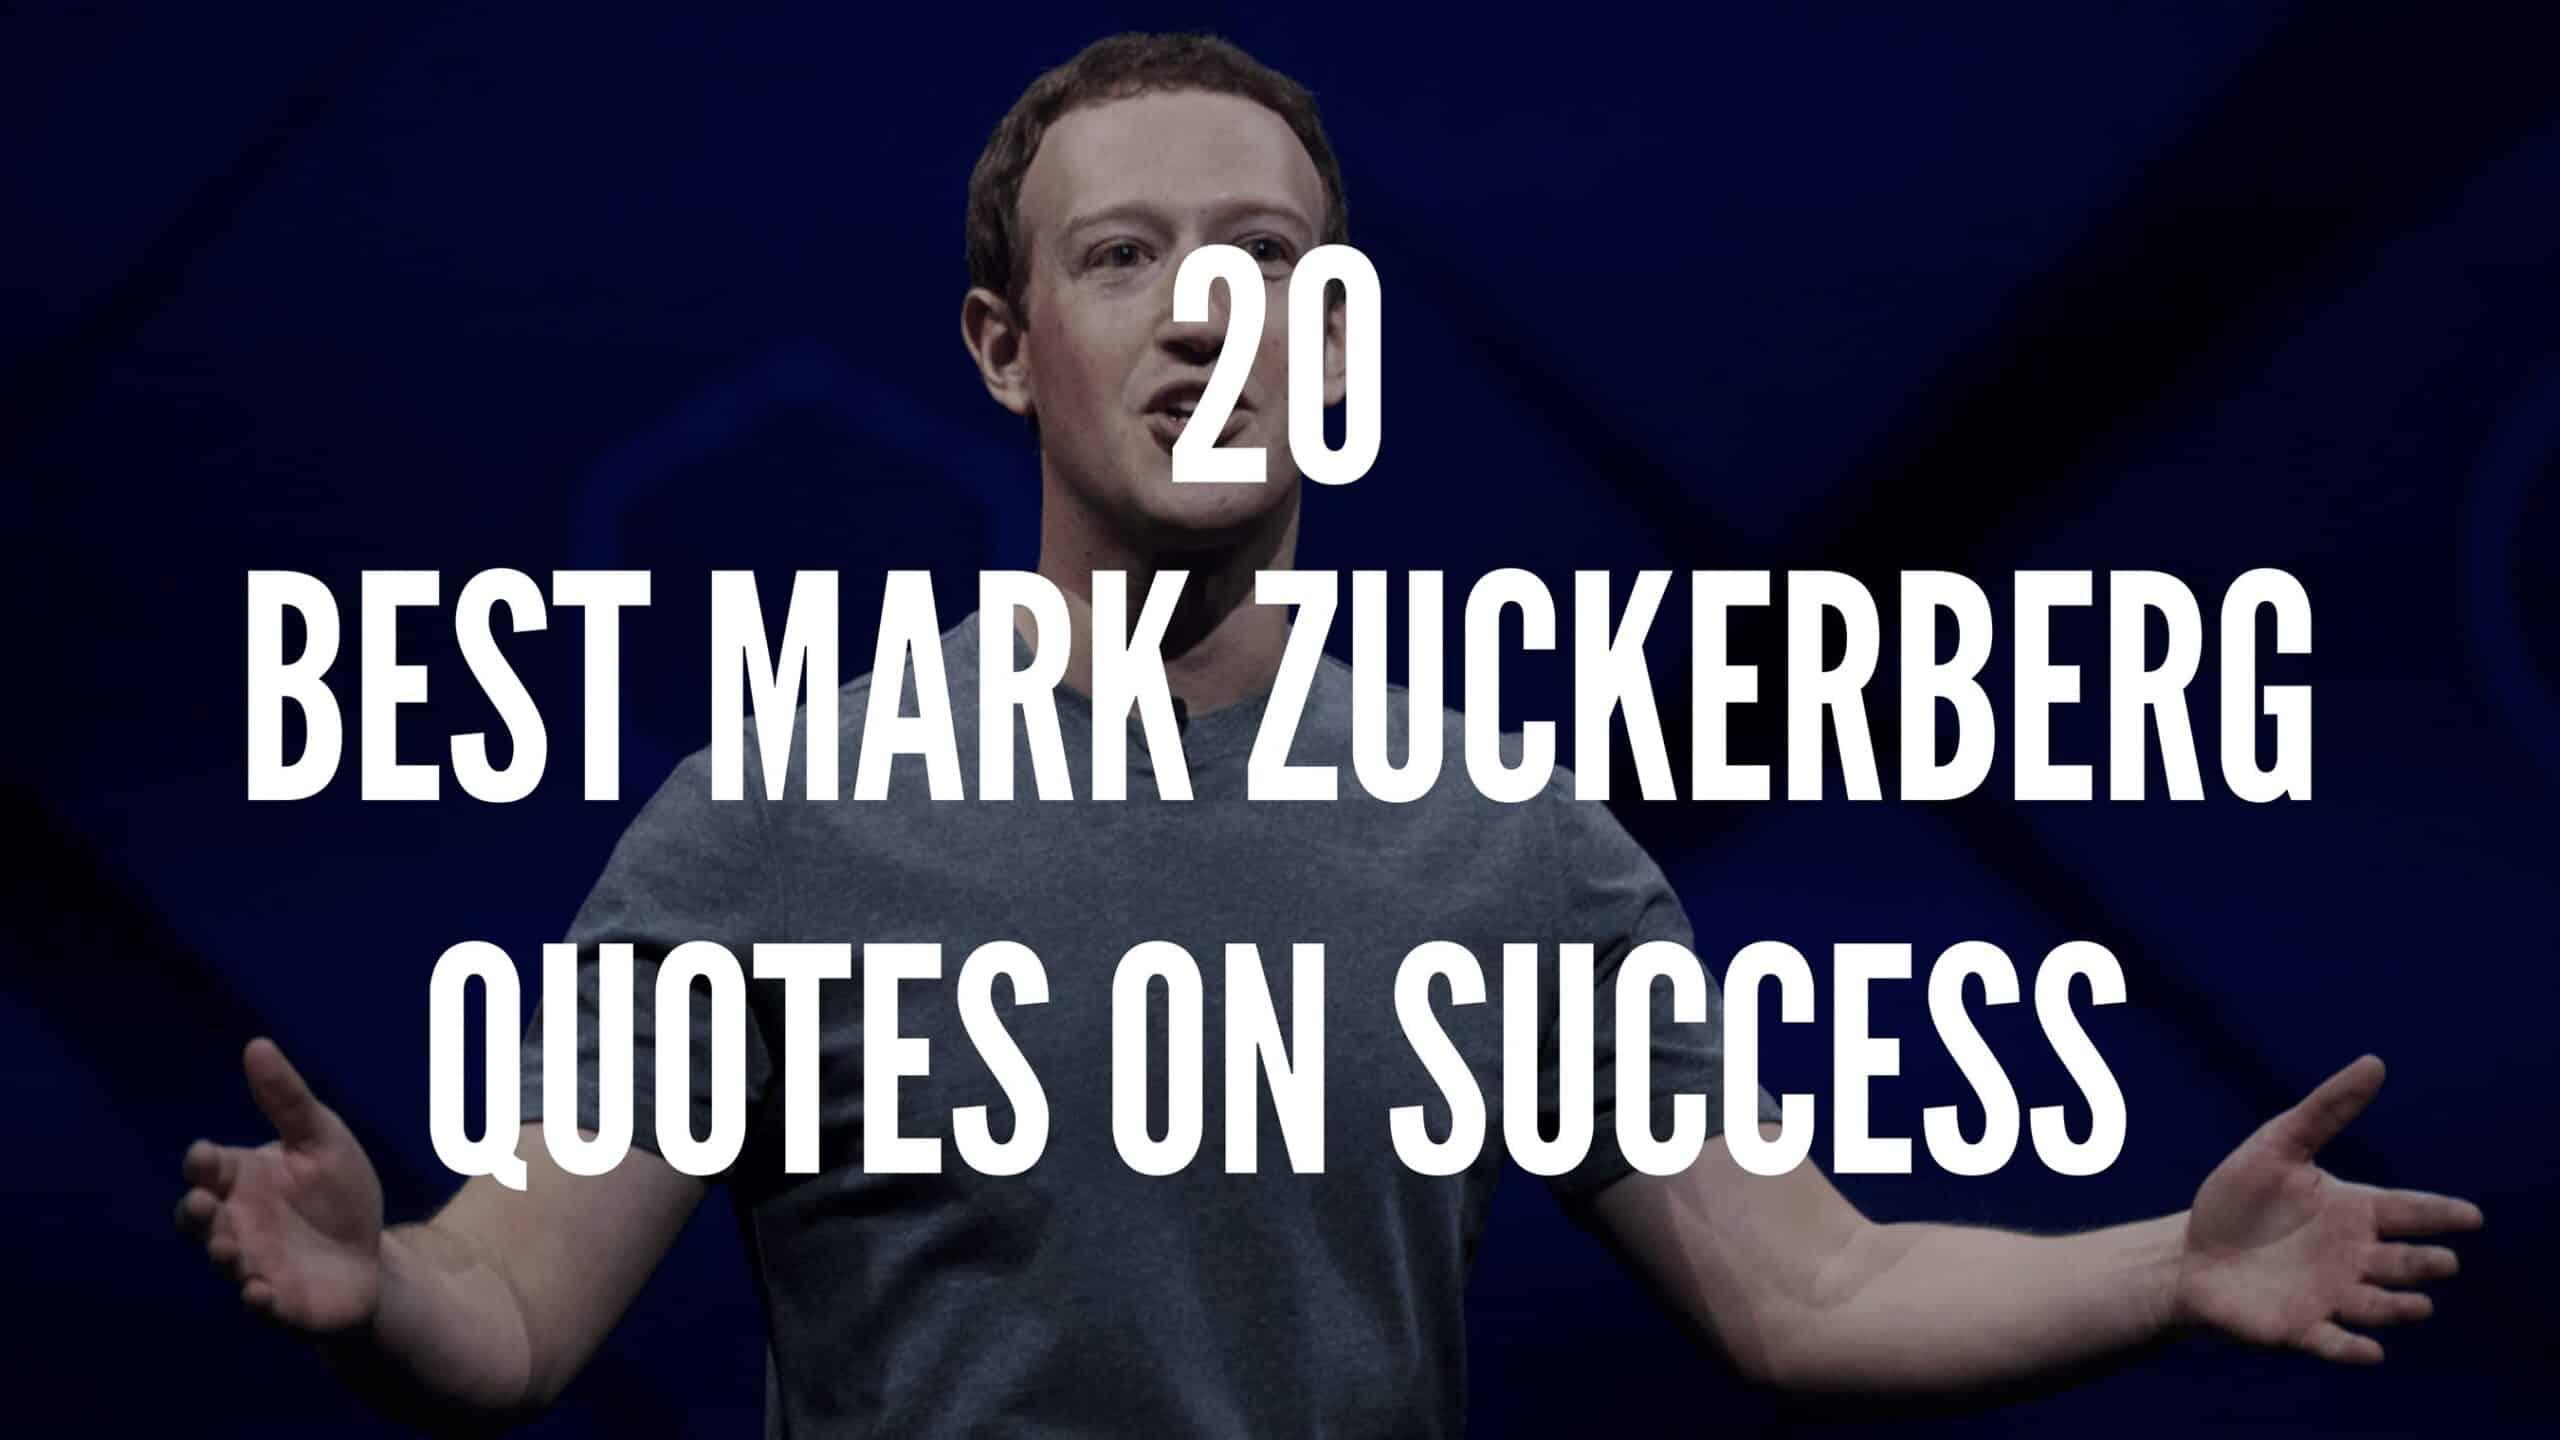 20 Best Mark Zuckerberg Quotes On Success